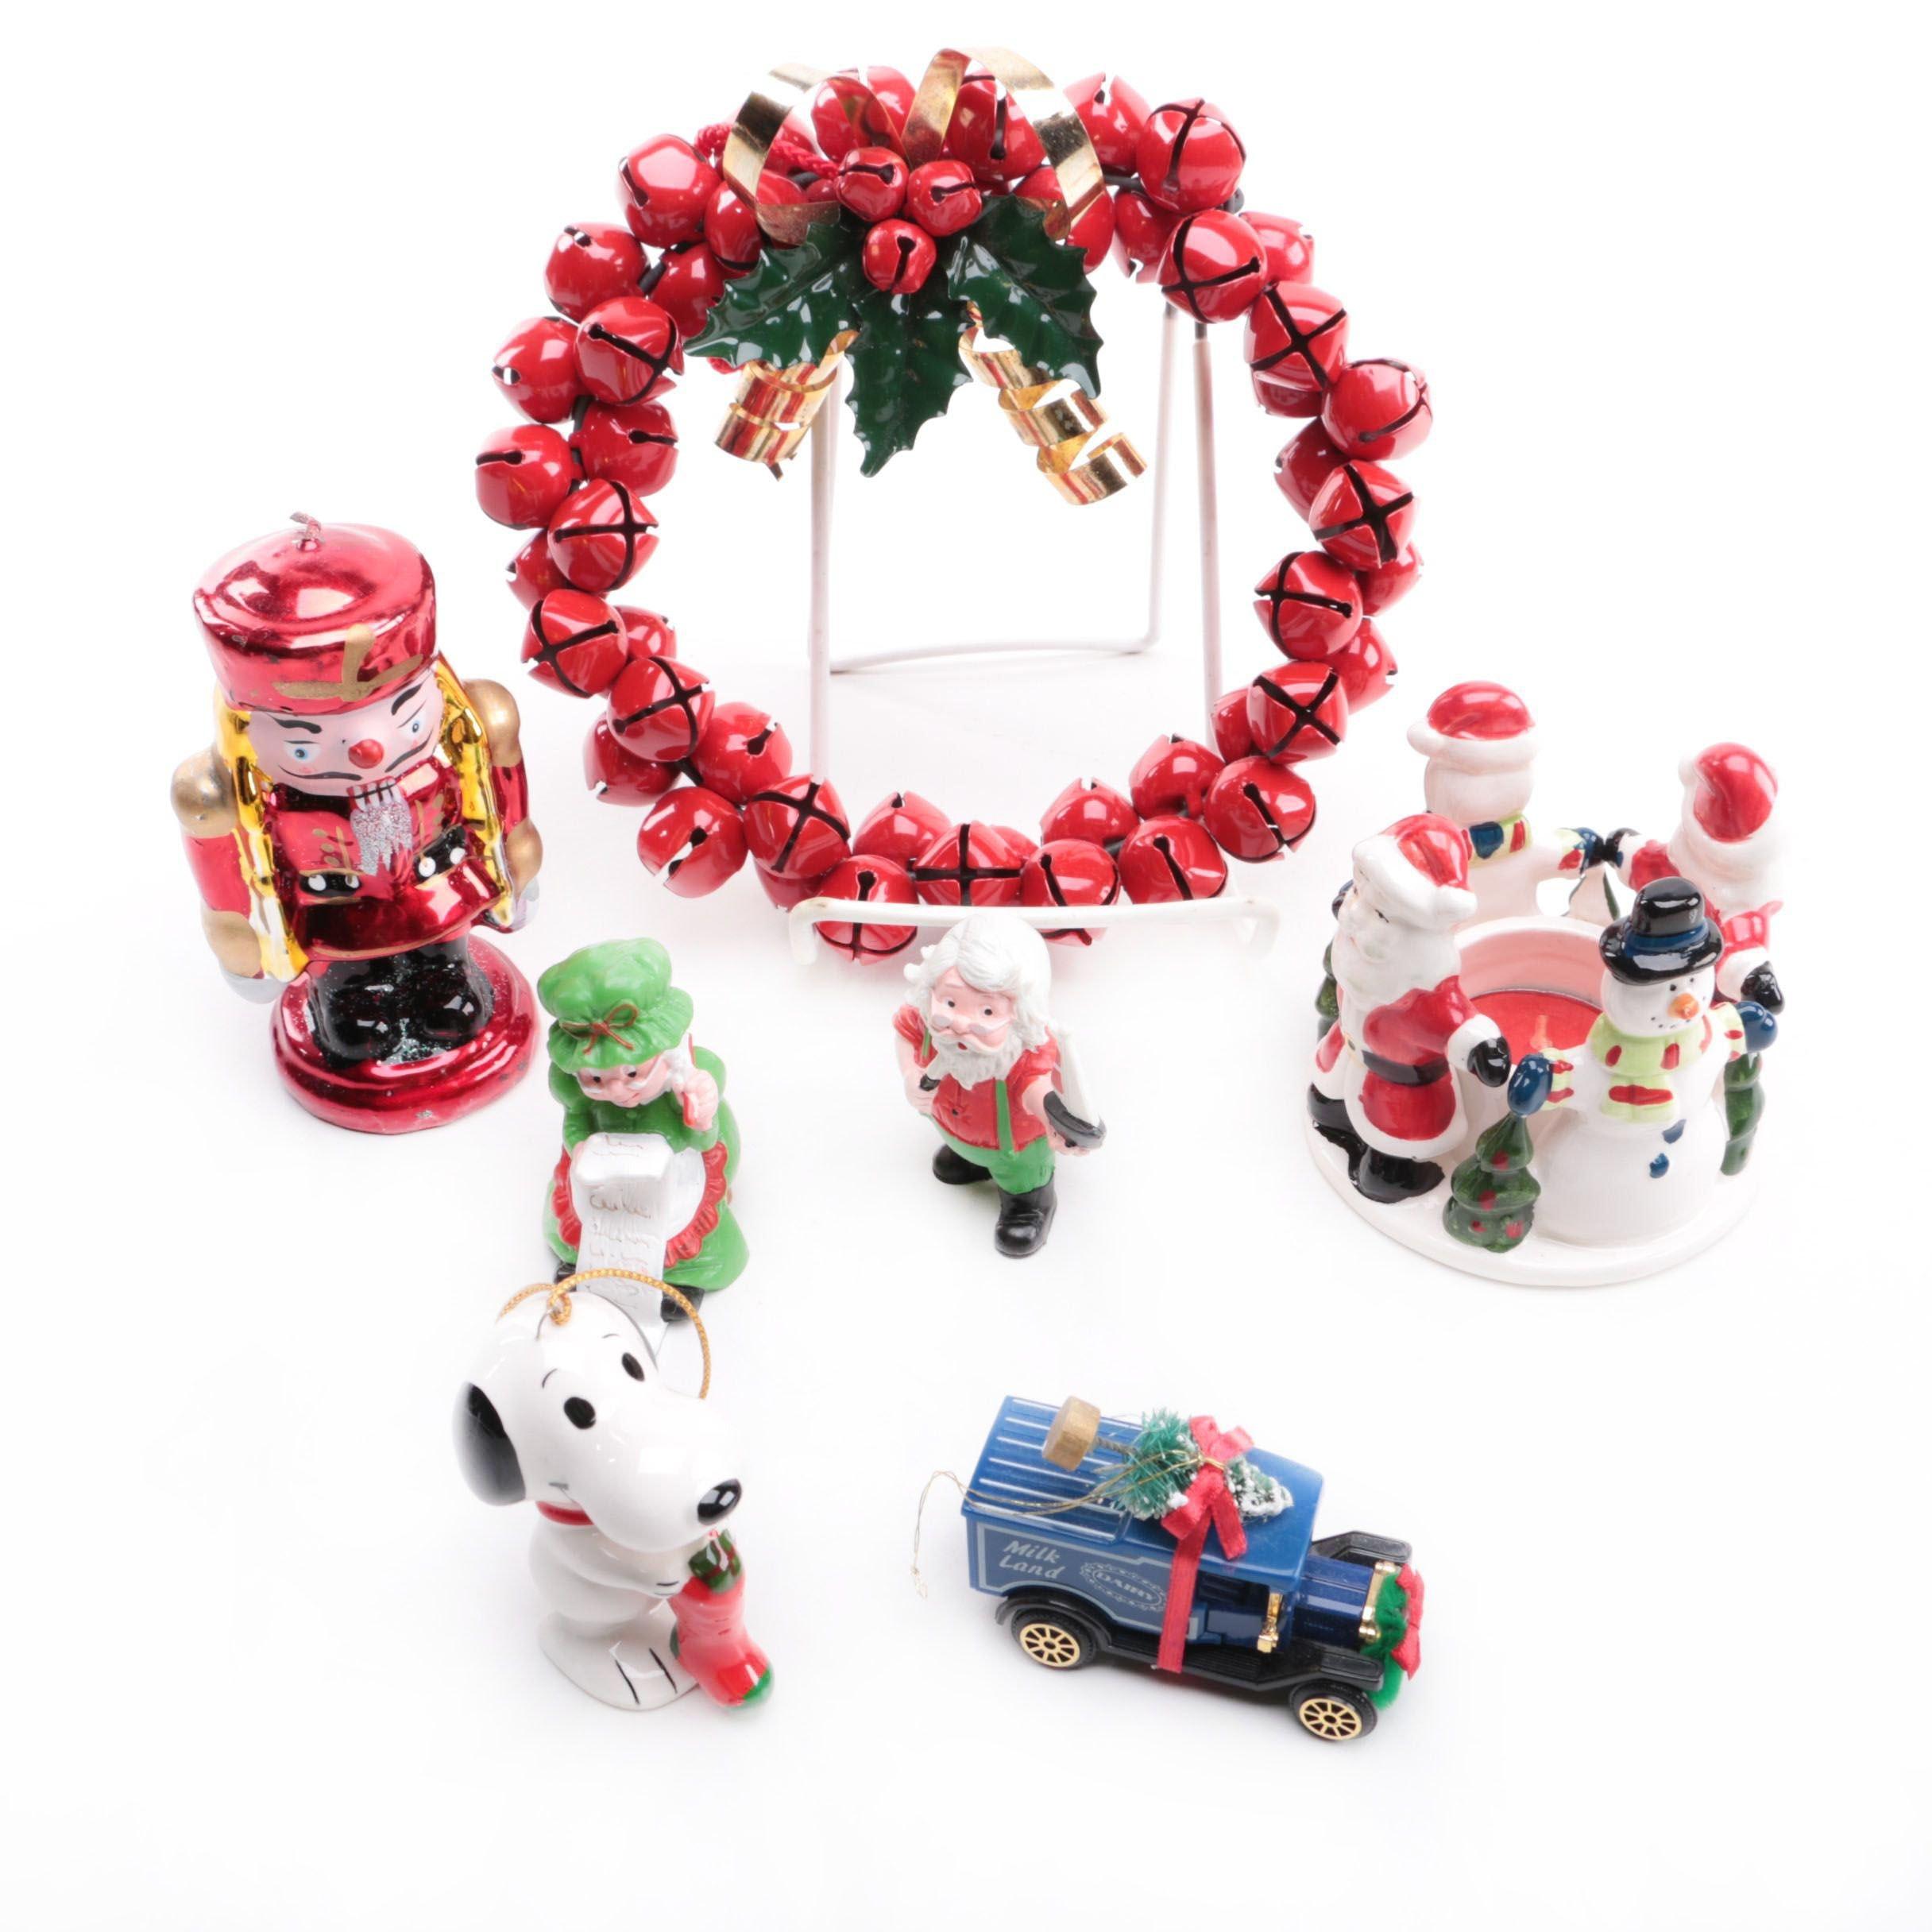 Assortment of Christmas Figurines